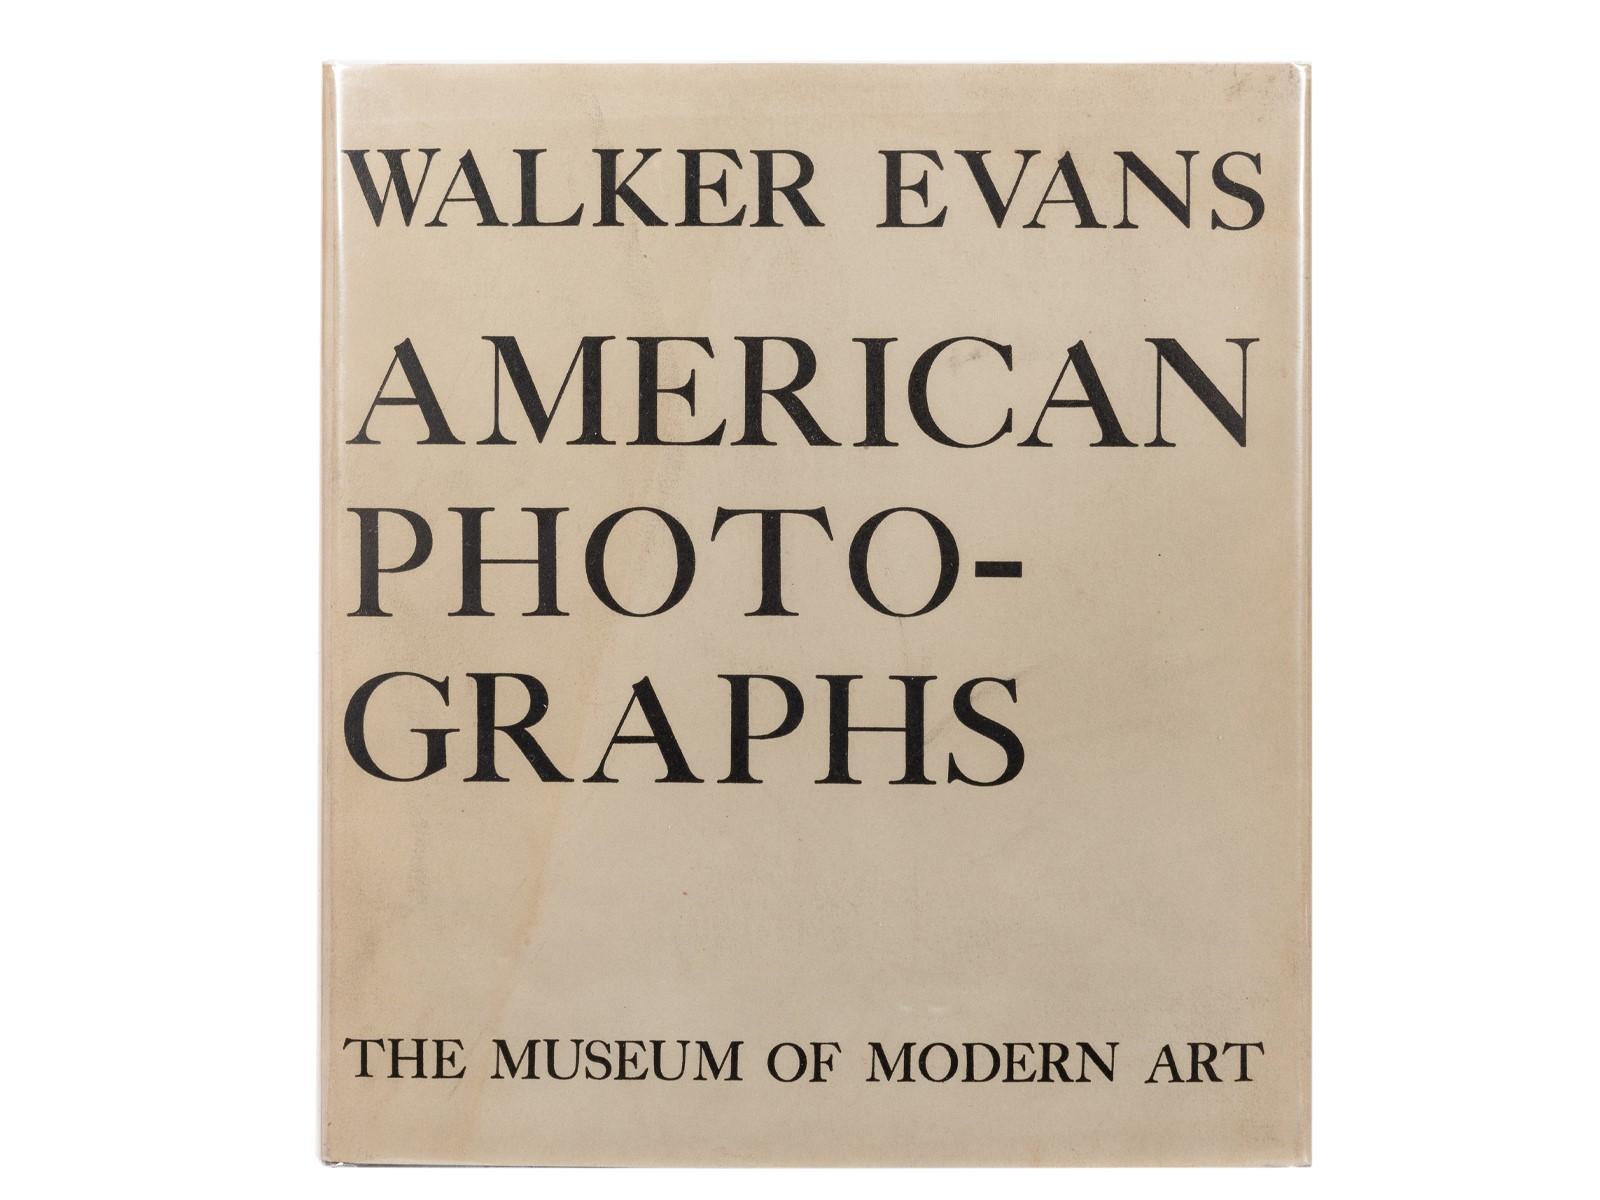 Walker Evans's American Photographs